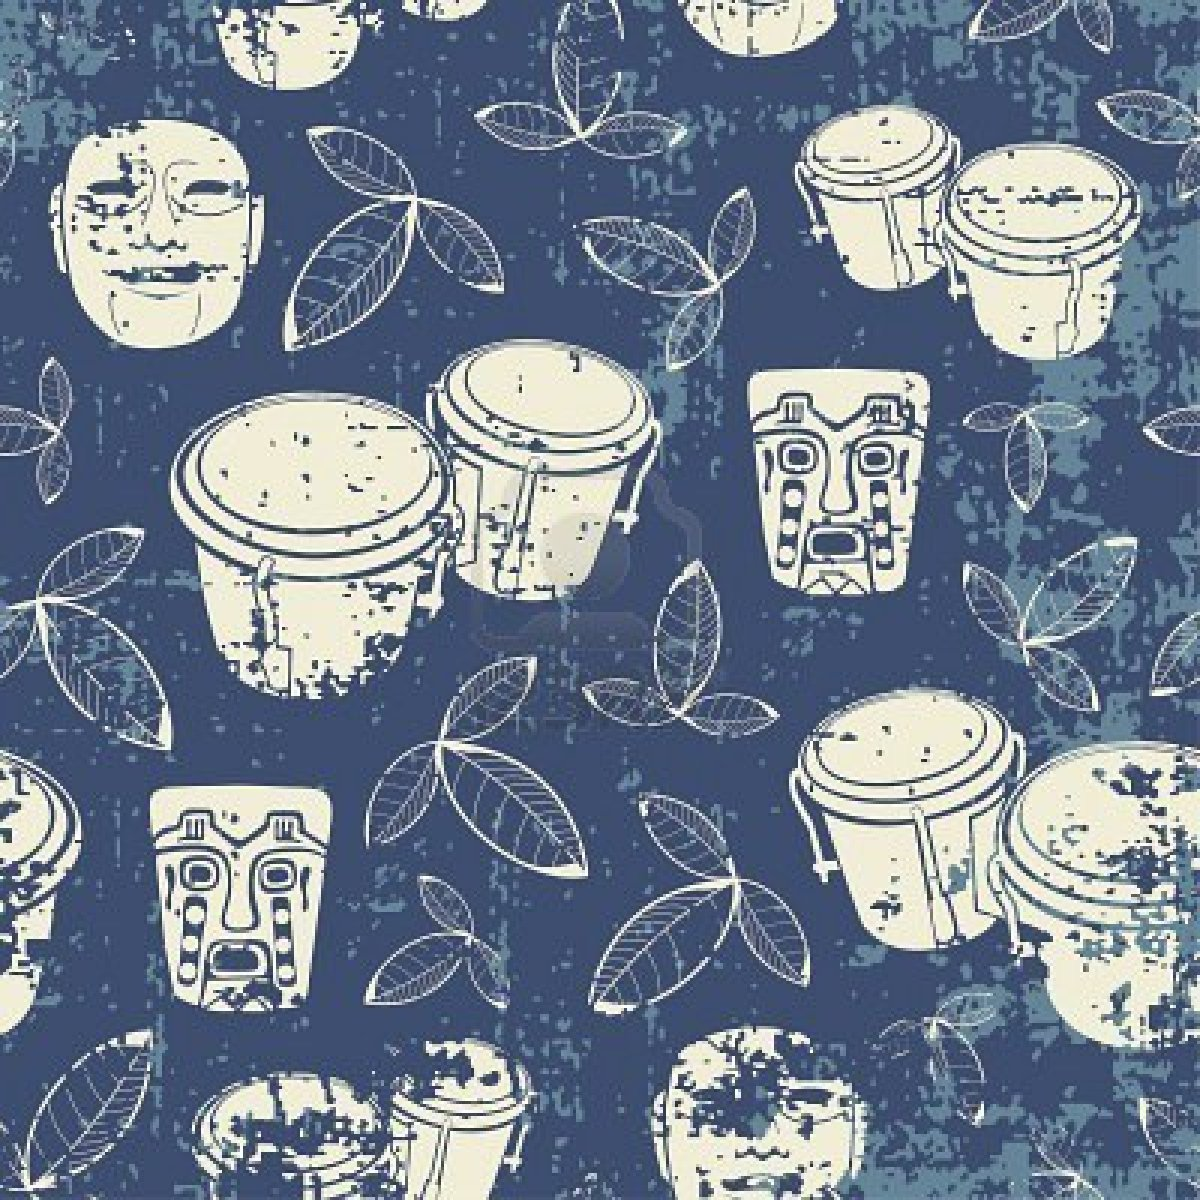 http://4.bp.blogspot.com/-8n35mSb48pE/T7Z6AU8vIdI/AAAAAAAADdQ/_iZdx9DJri0/s1600/4464015-aztec-pattern-in-grunge-style.jpg